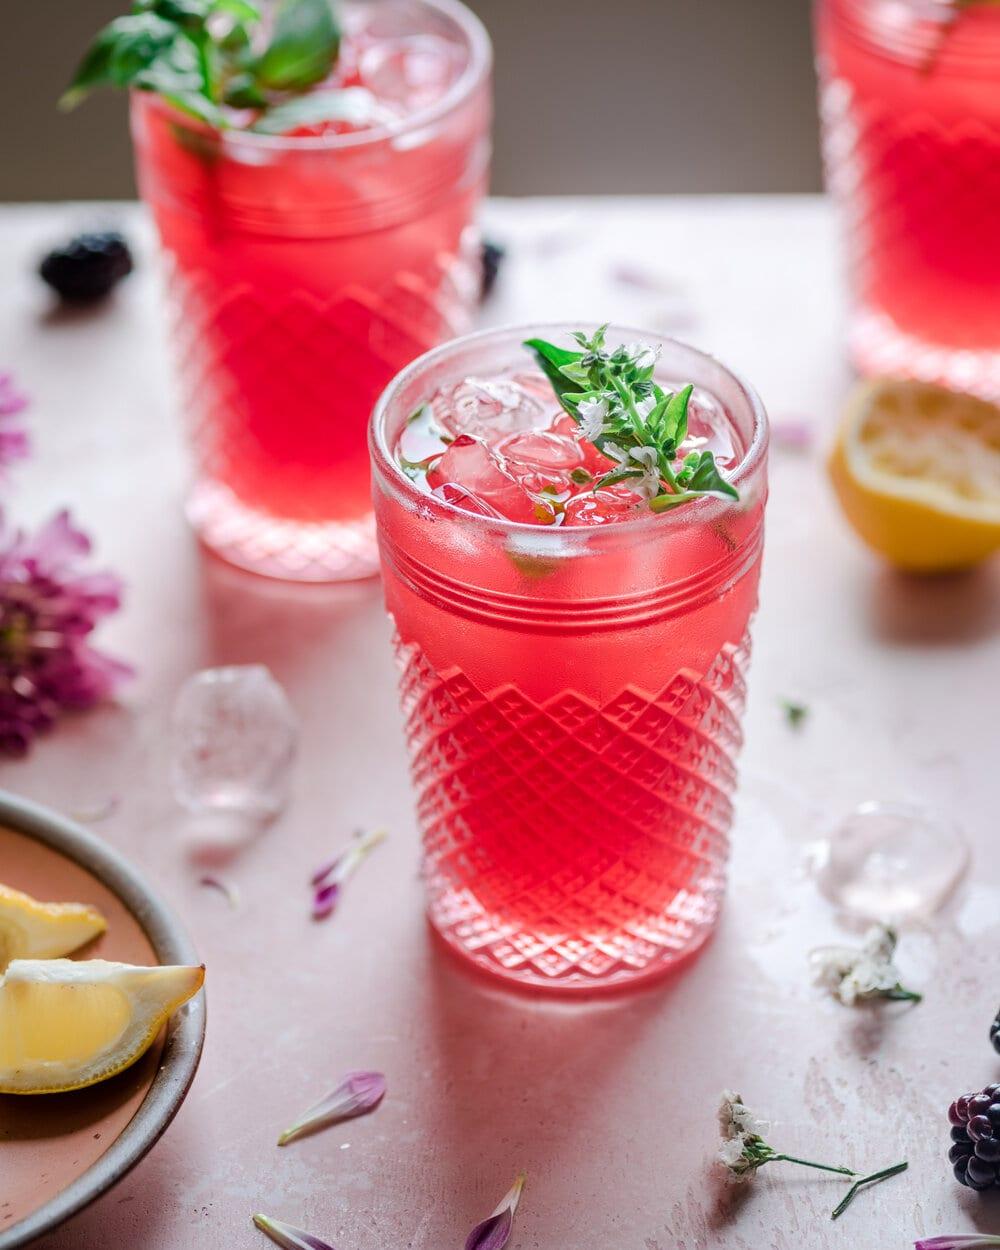 Healthy Blackberry Basil Lemonade. lemonade photography. drink photography.